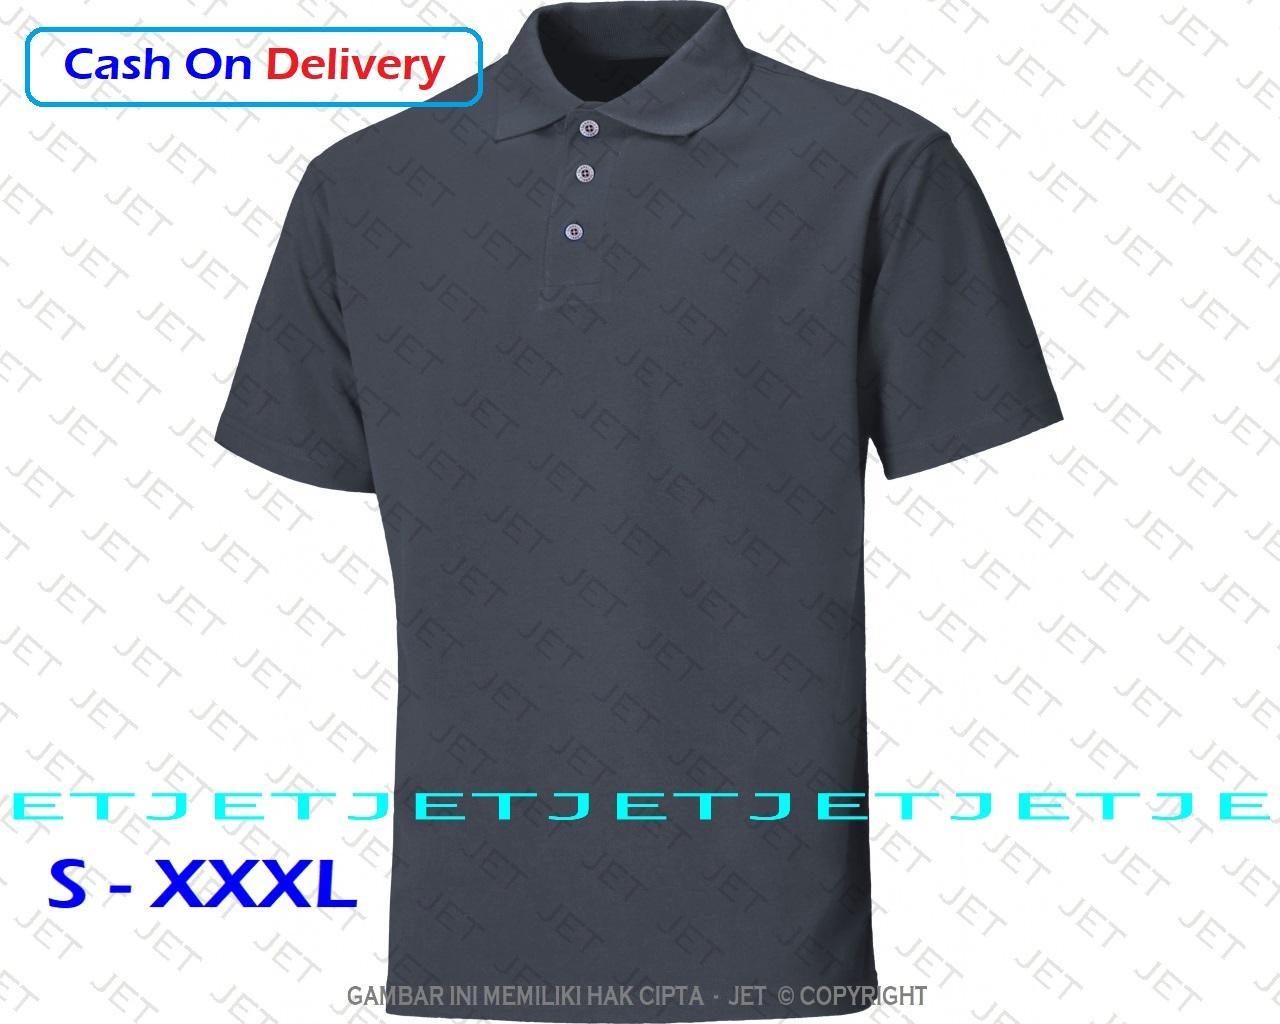 JeT – Polo Shirt – Size Lengkap - 22 Warna – Pria Wanita - Fashion Berkerah e02ea8f195